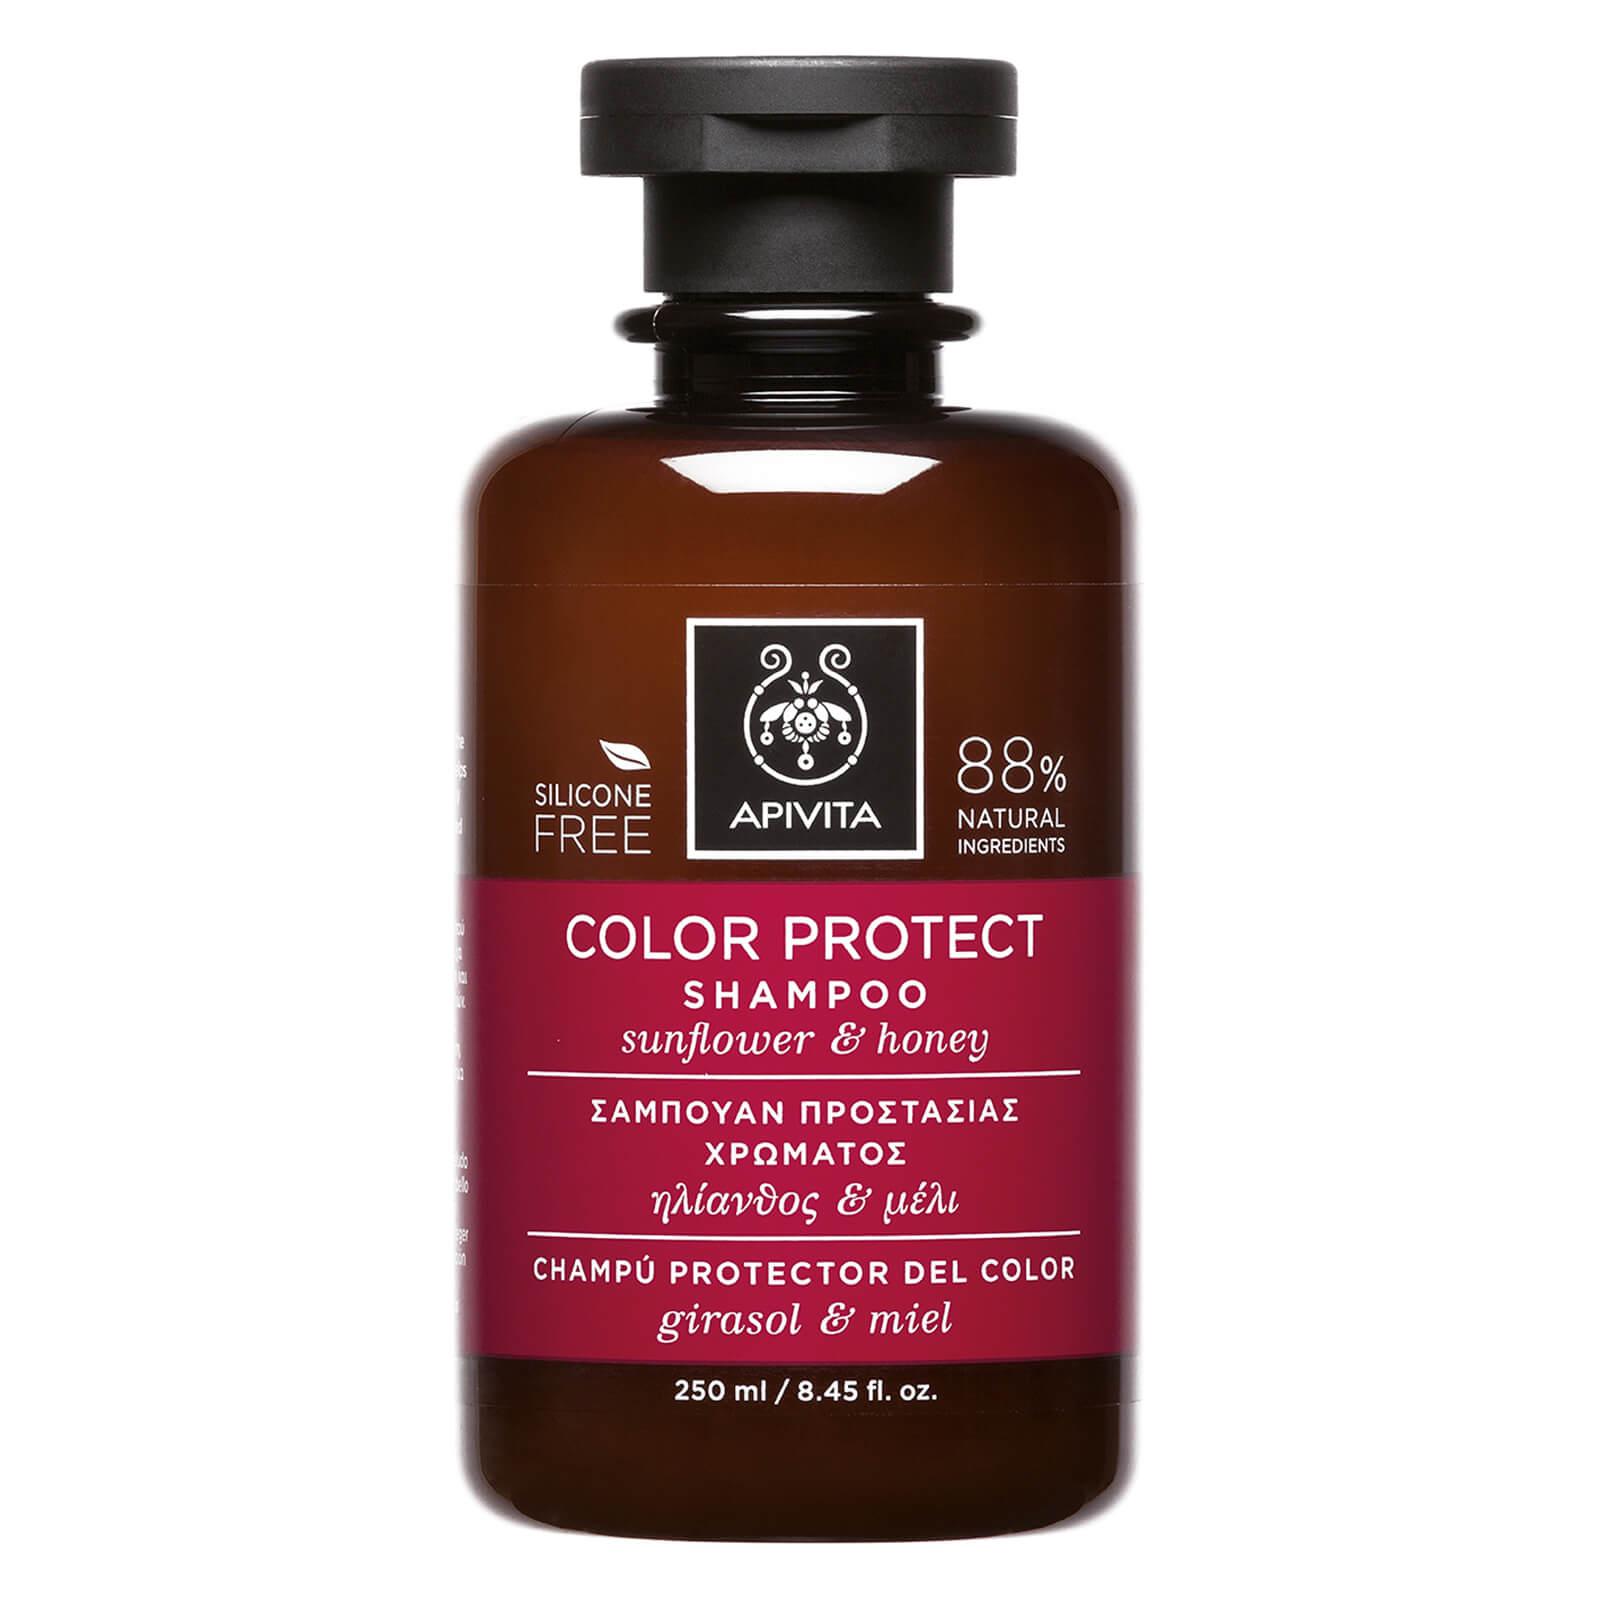 APIVITA Holistic Hair Care Color Protect Shampoo - Sunflower   Honey 250ml.  Description 61cf8962b13